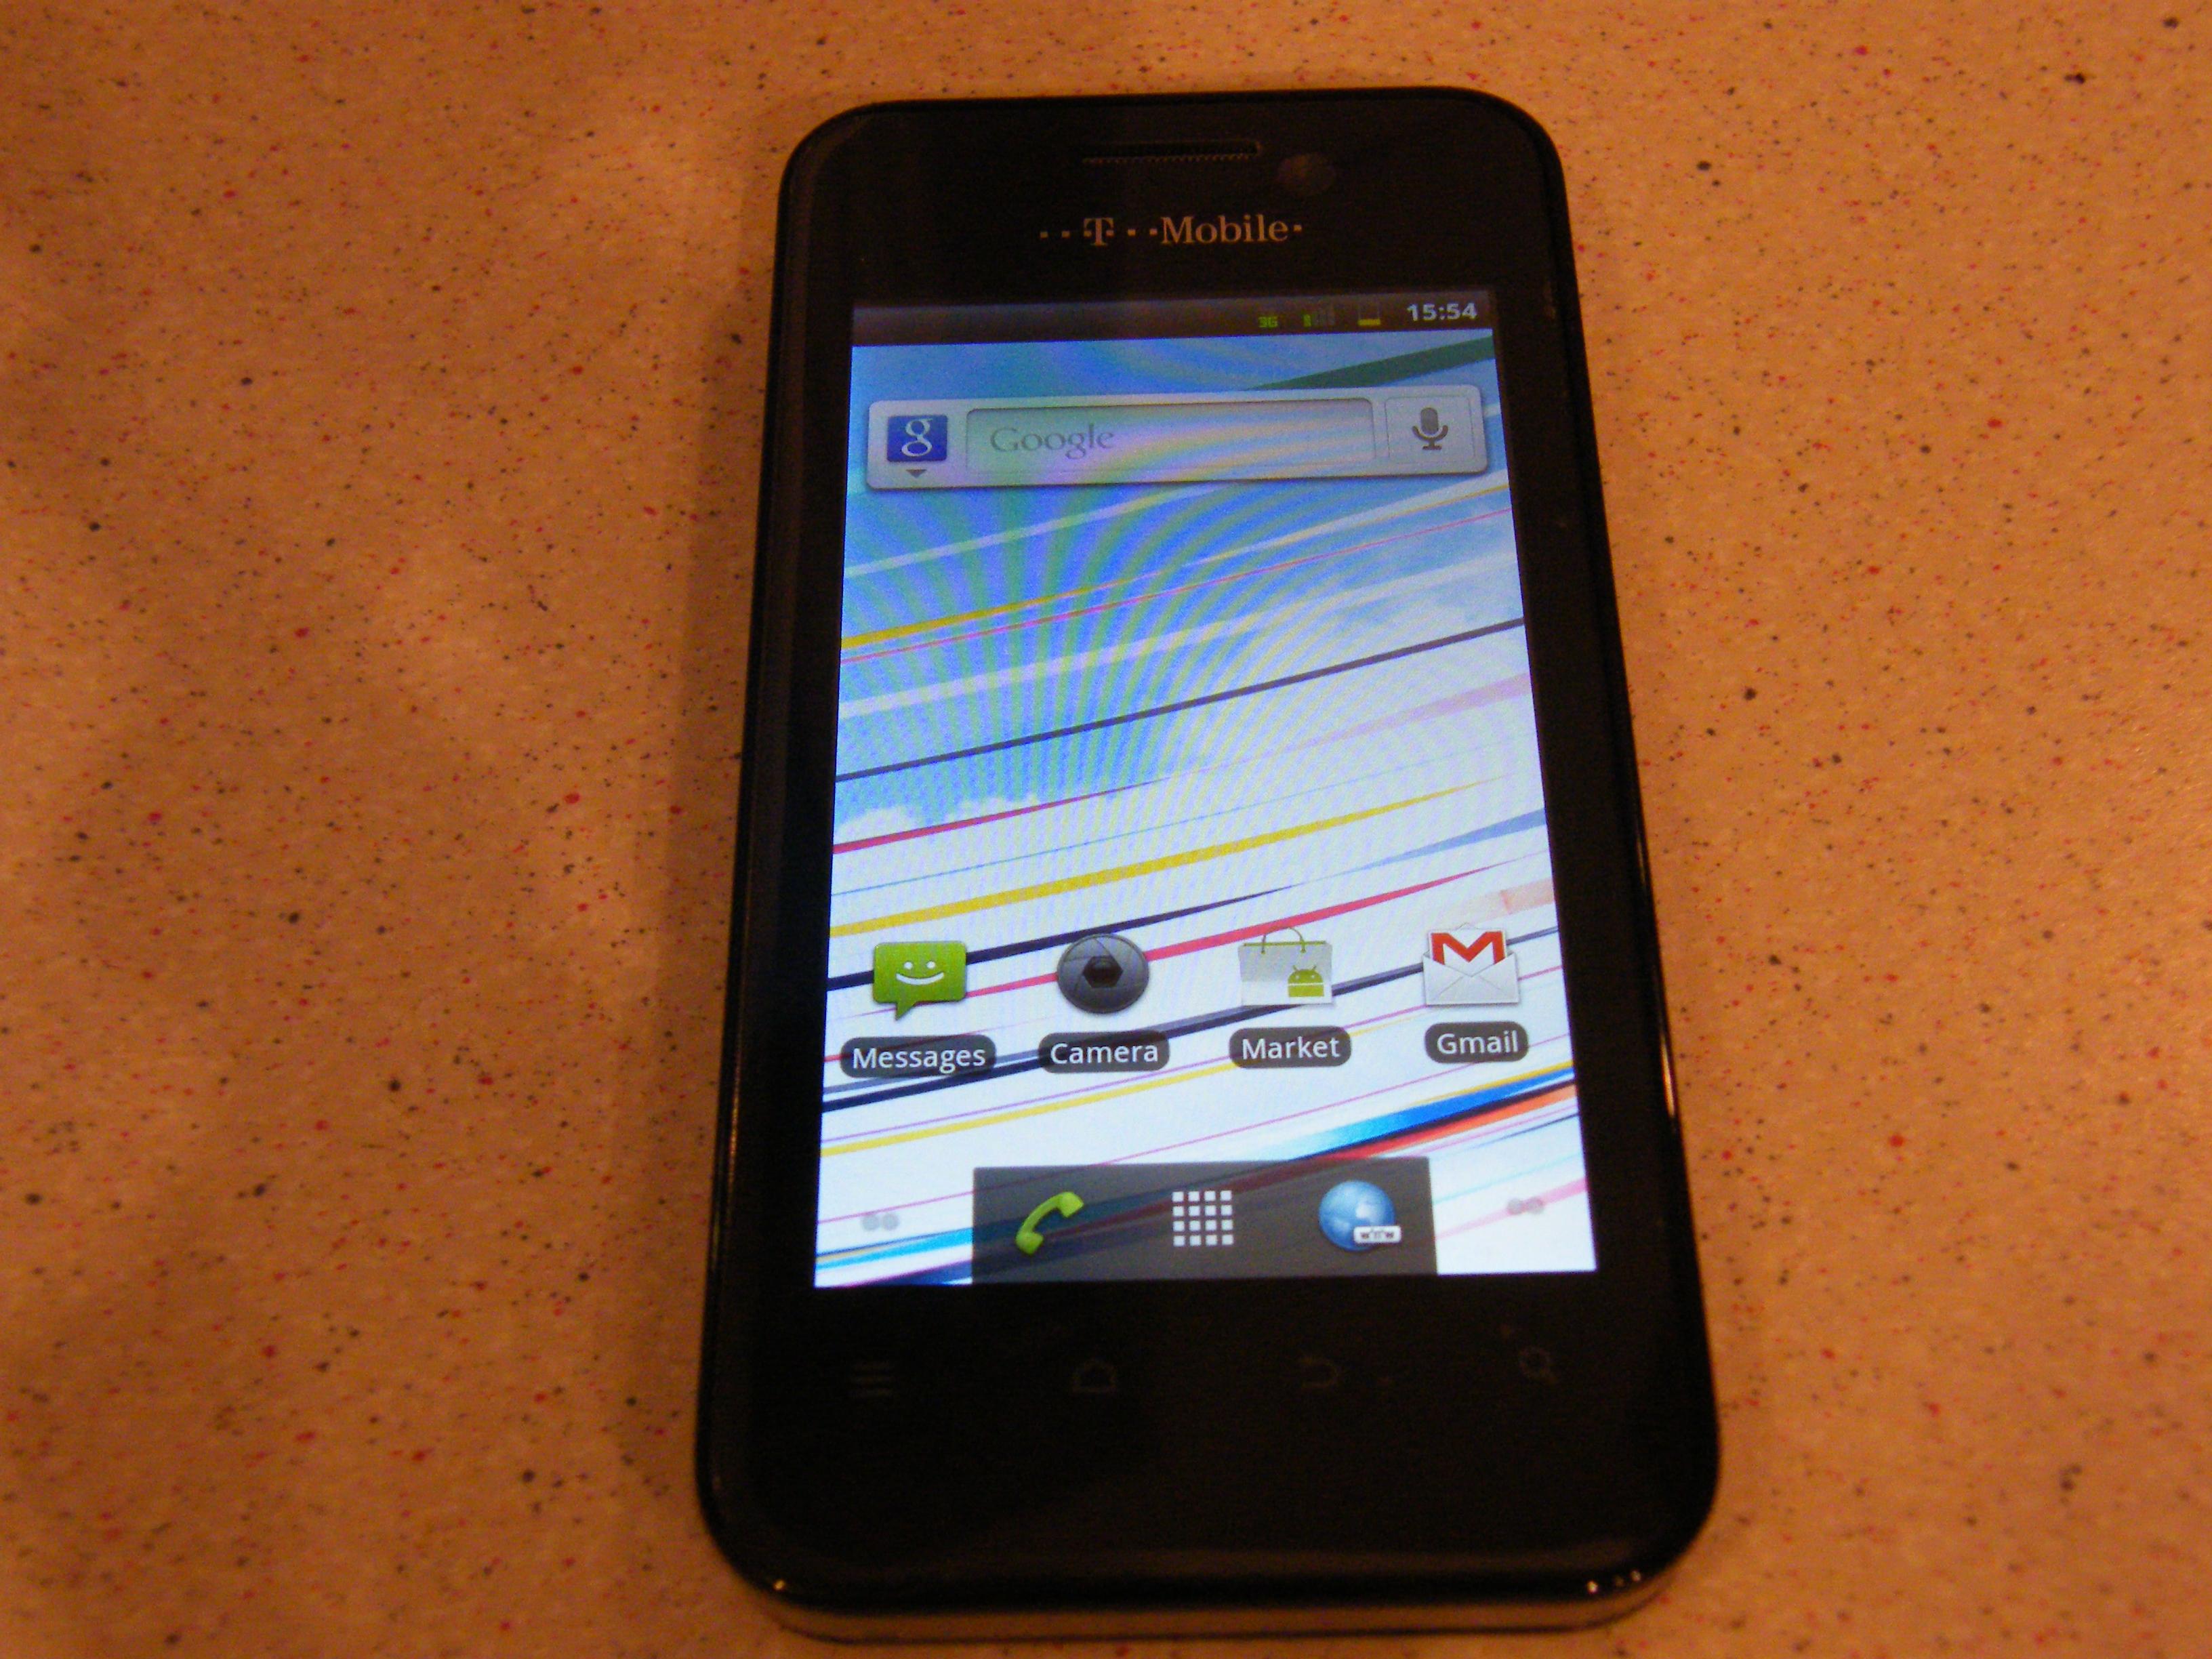 t mobile vivacity review coolsmartphone rh coolsmartphone com Viva City Biometric Screenings Viva City Ad